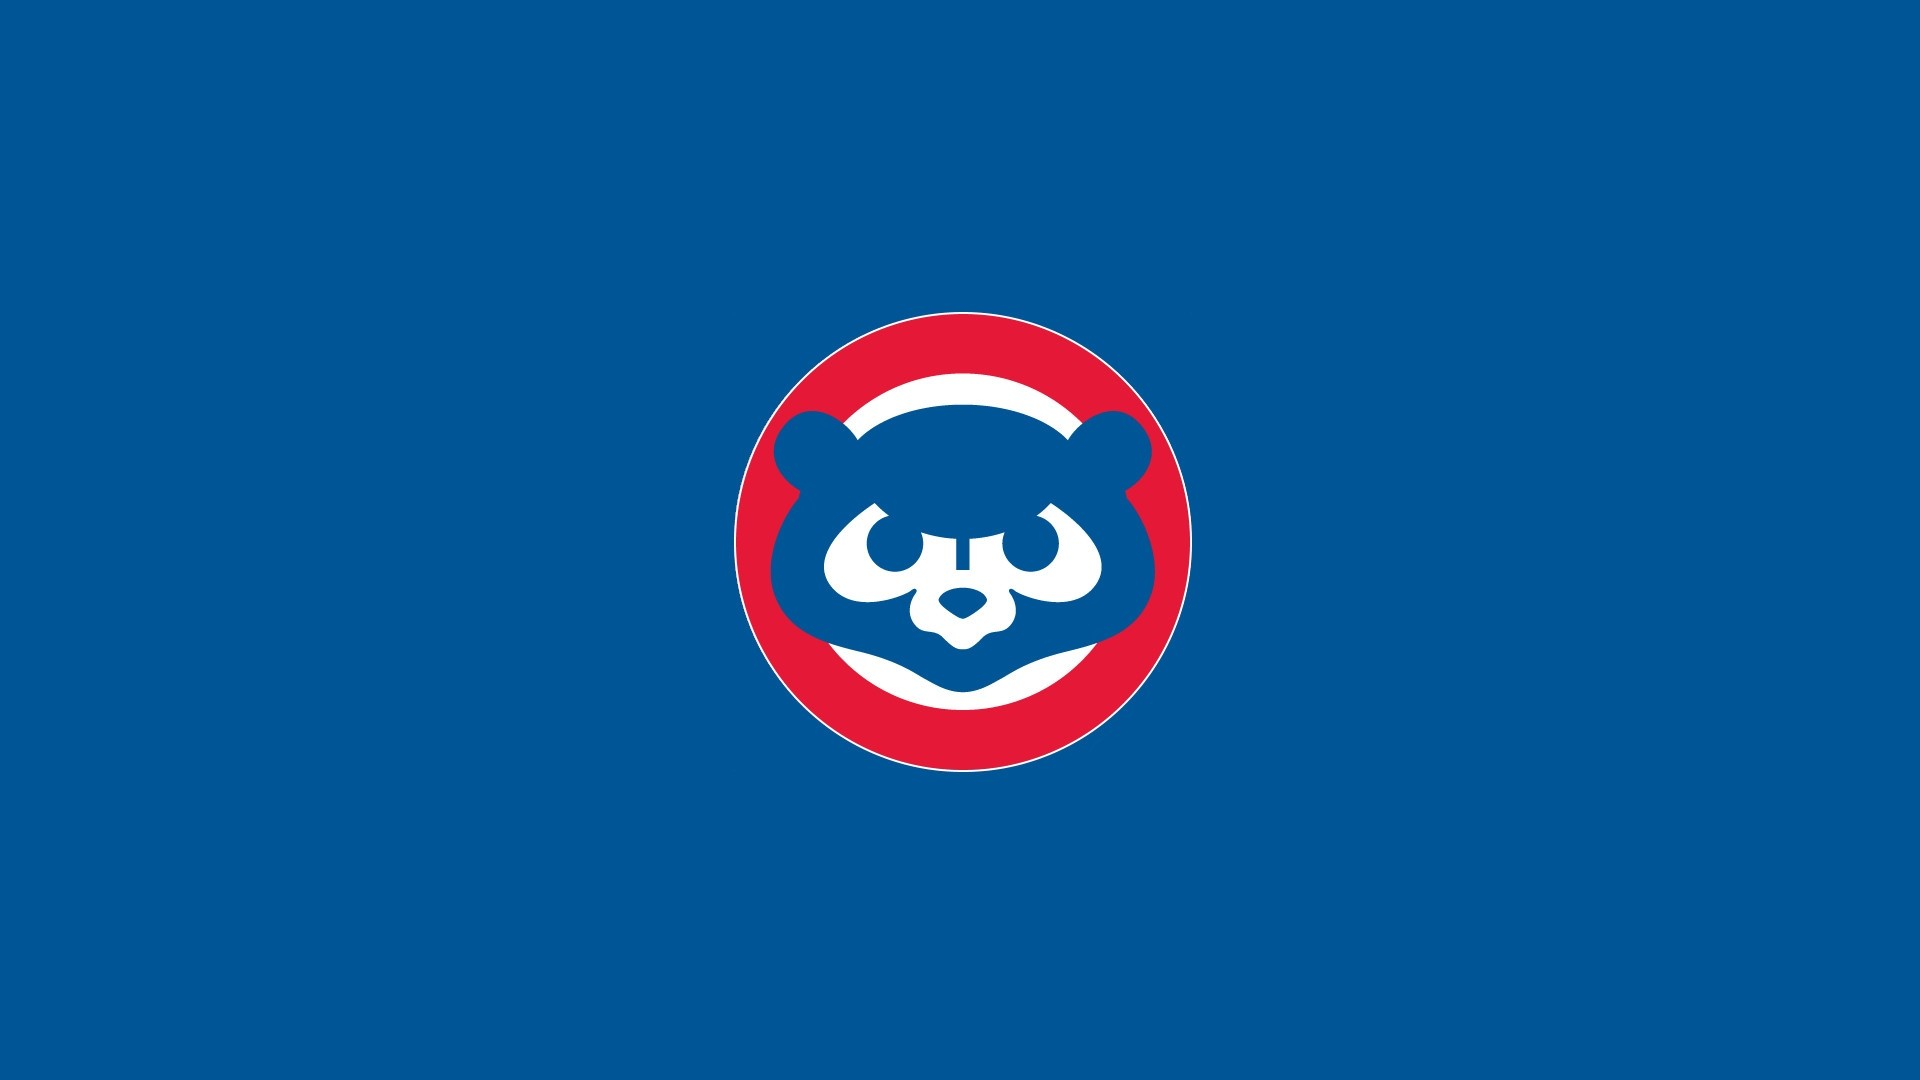 Cubs HD Download